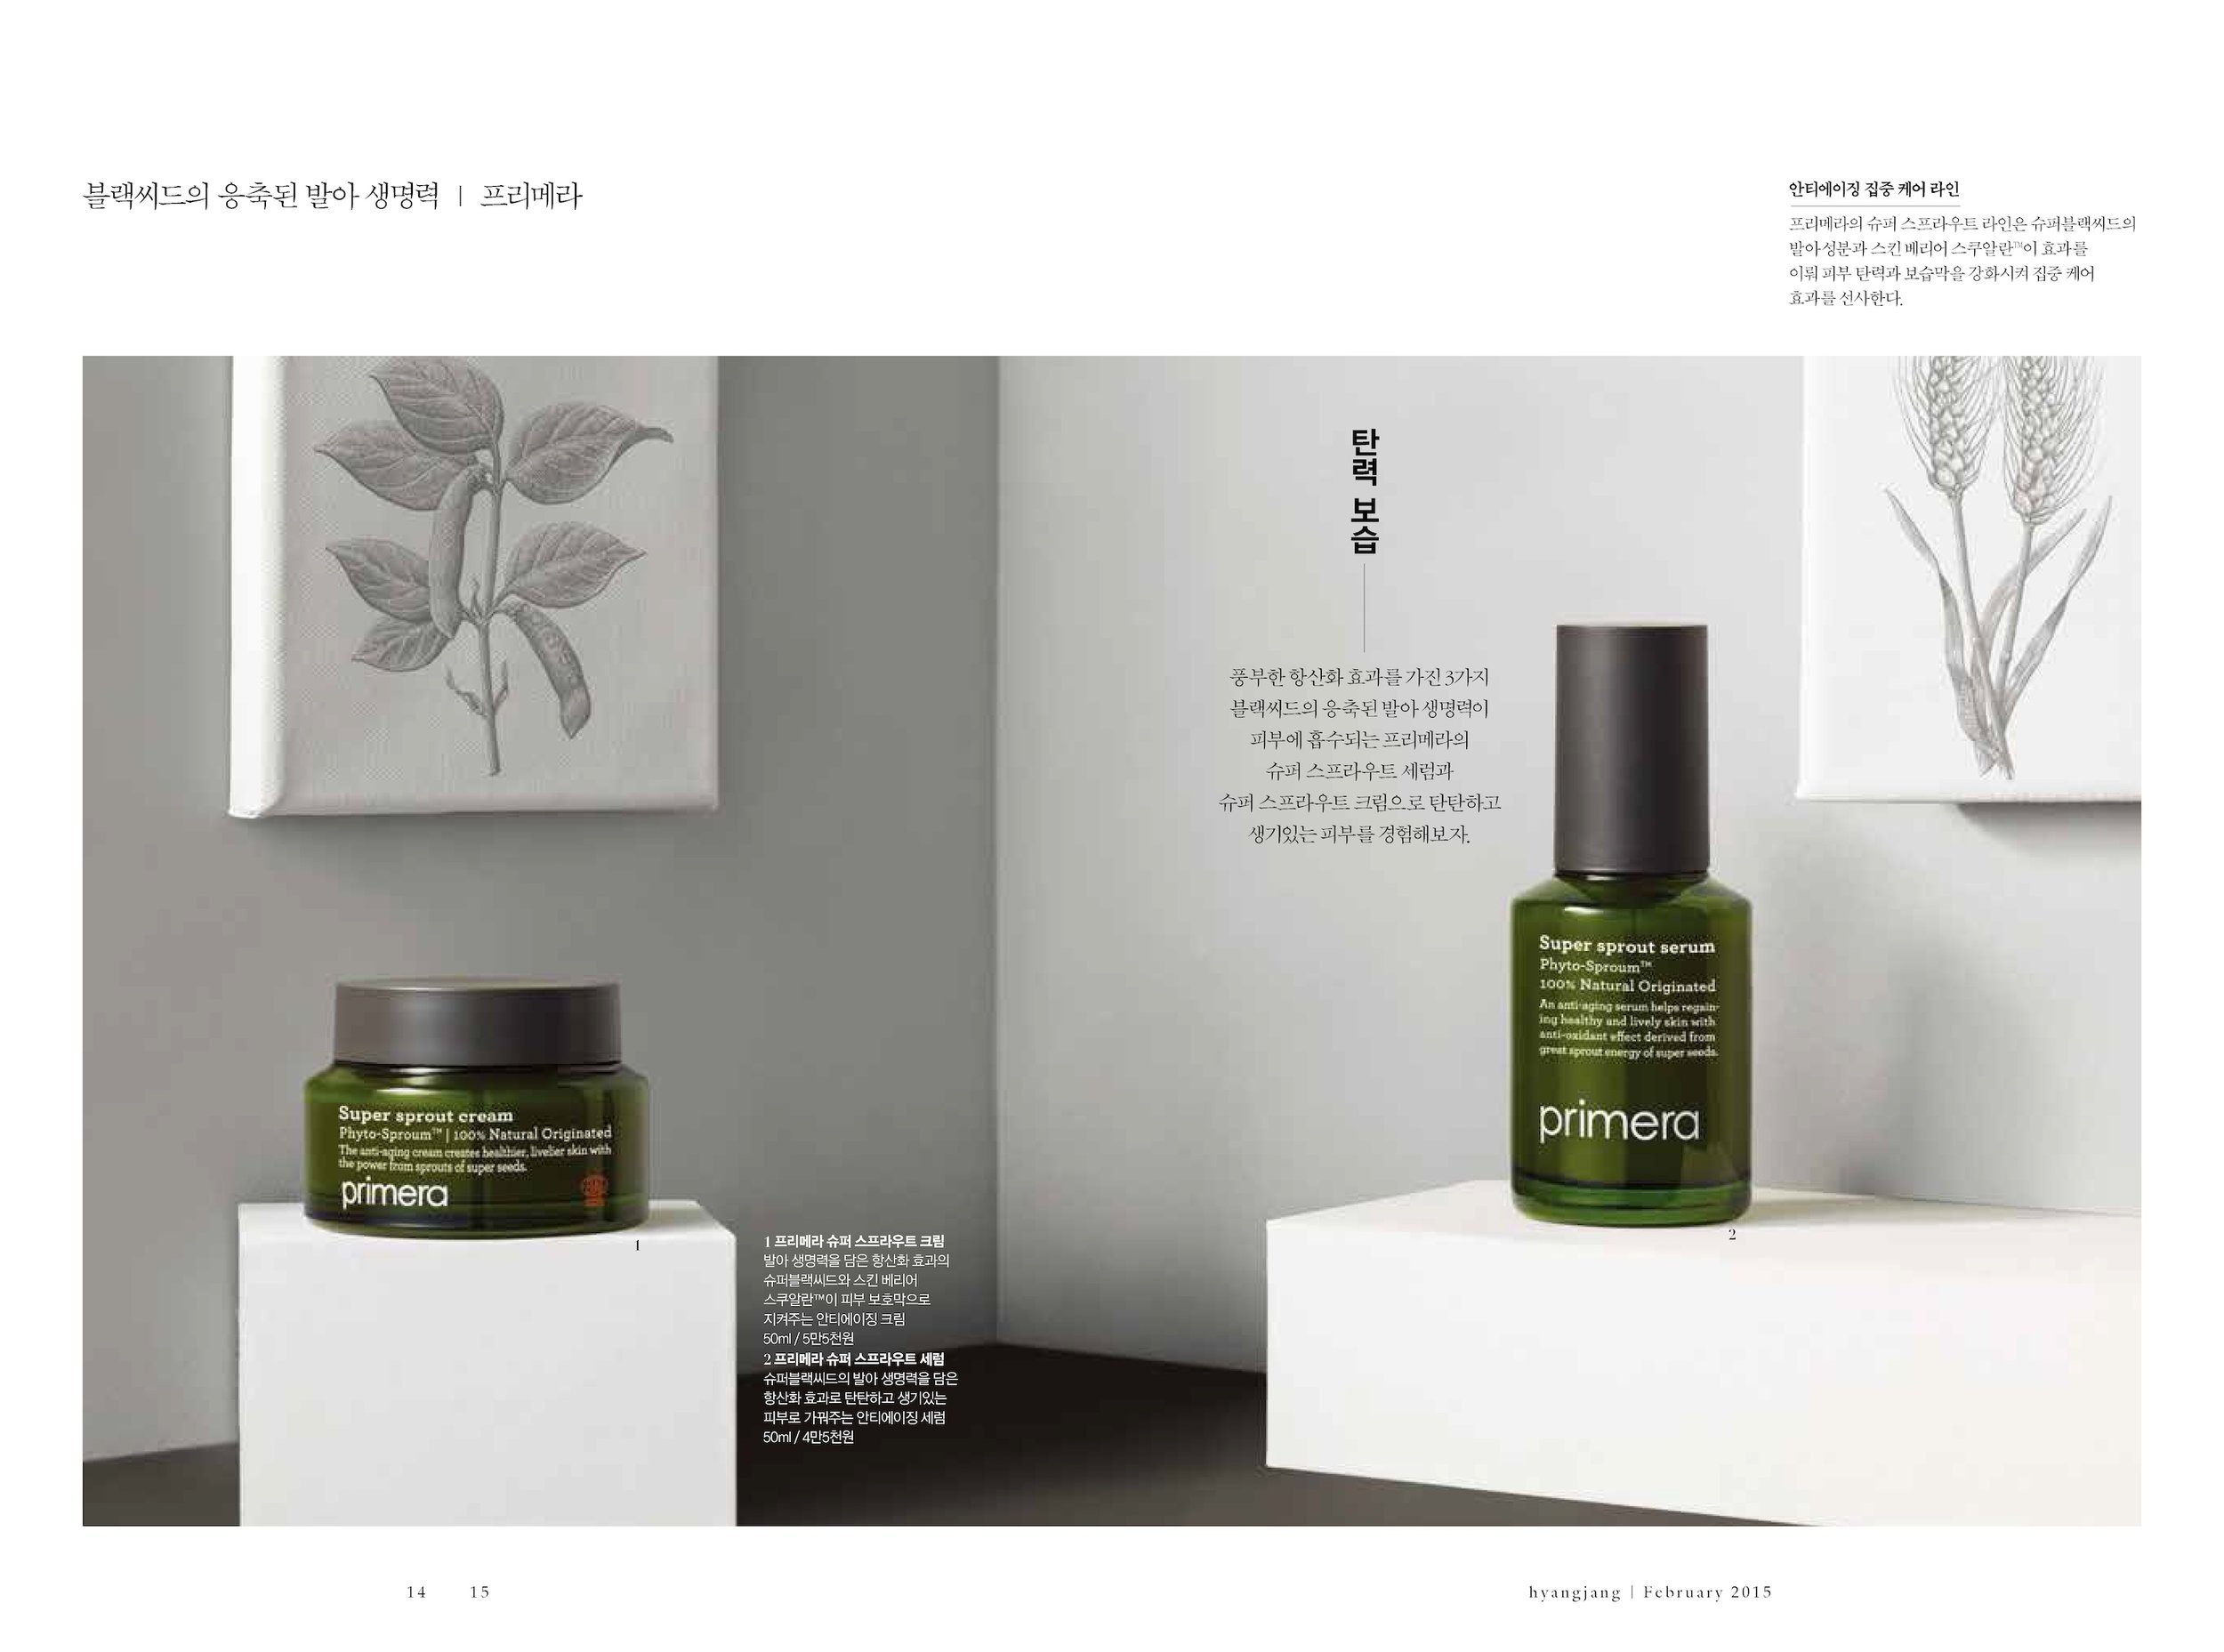 hyangjang-201502_페이지_08.jpeg